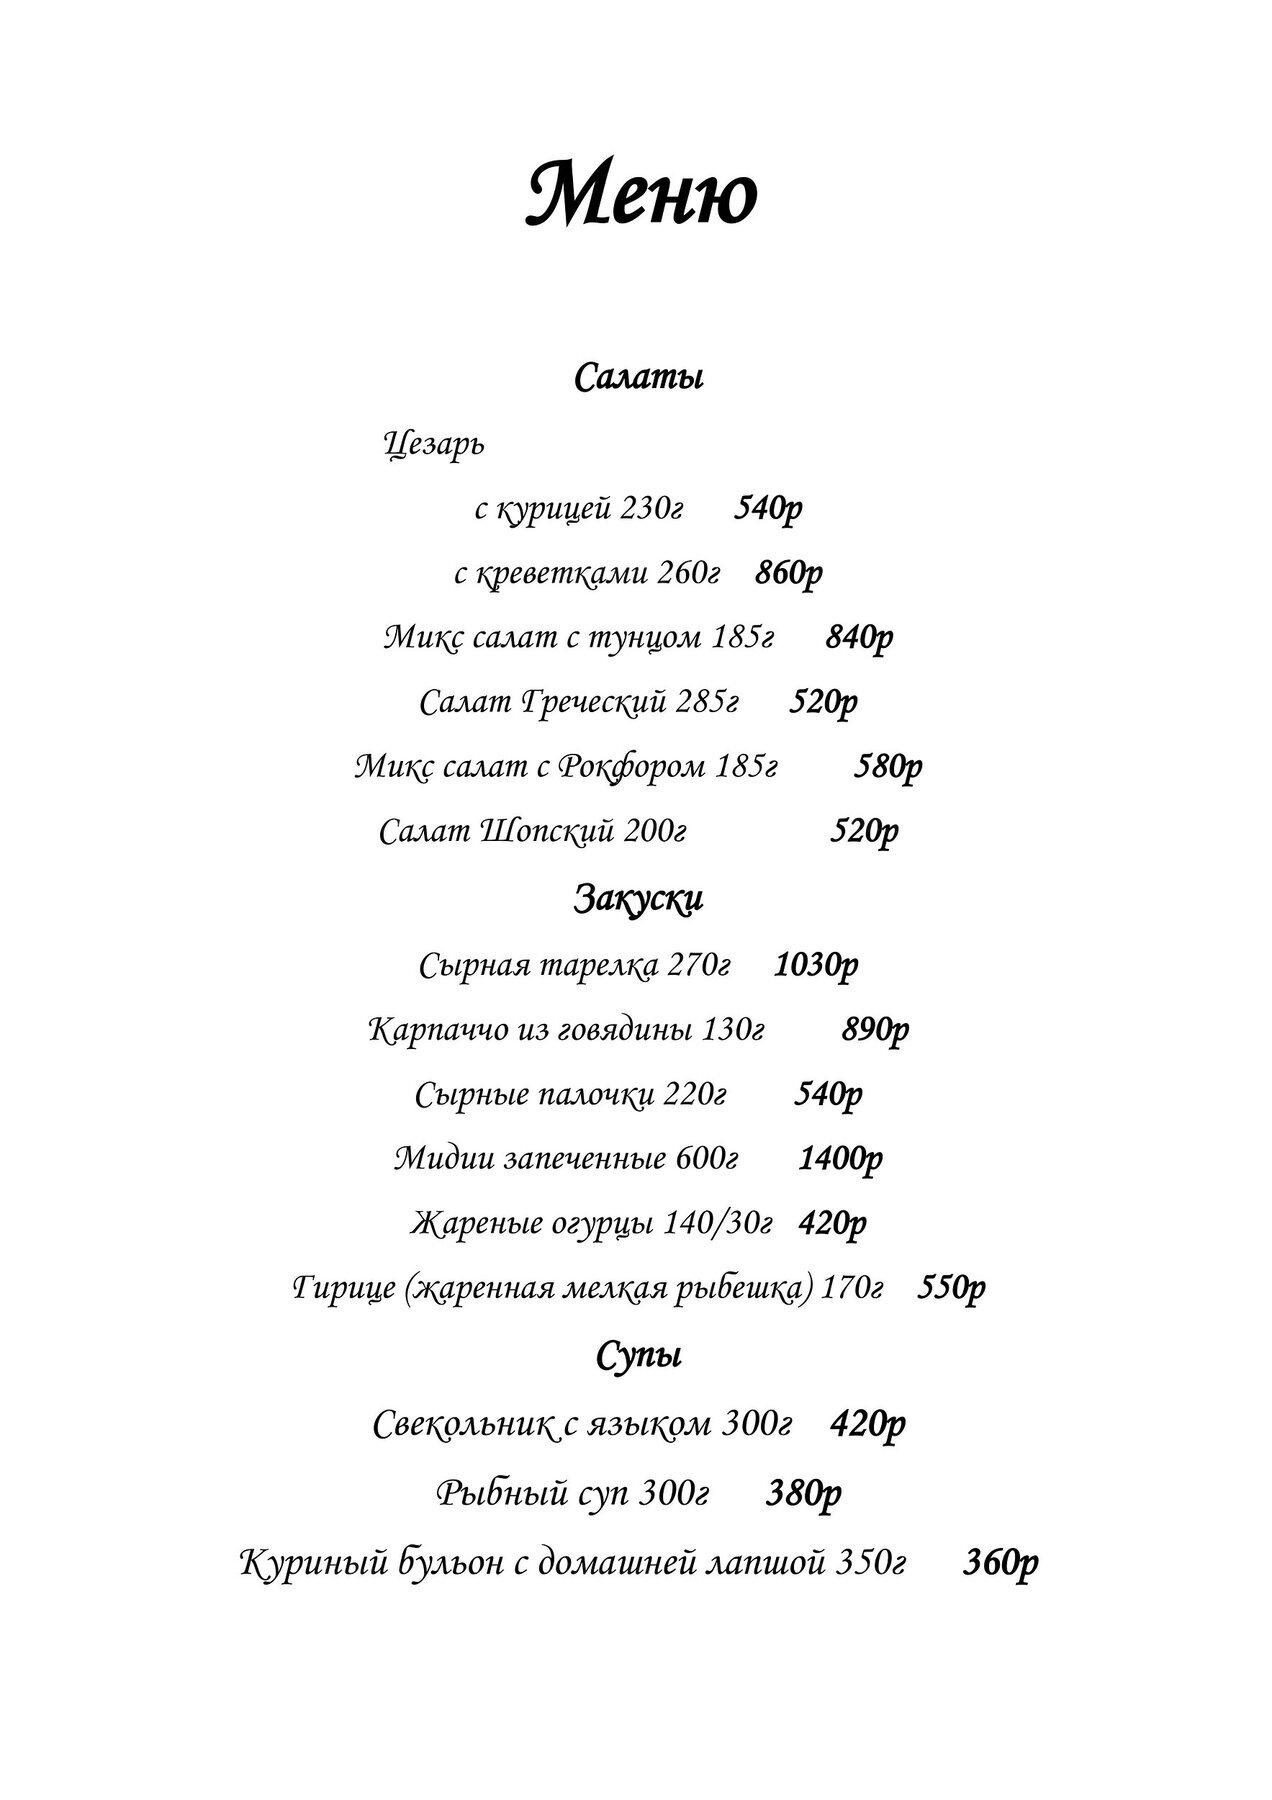 Меню ресторана Колесо времени на Новокузнецкой фото 1